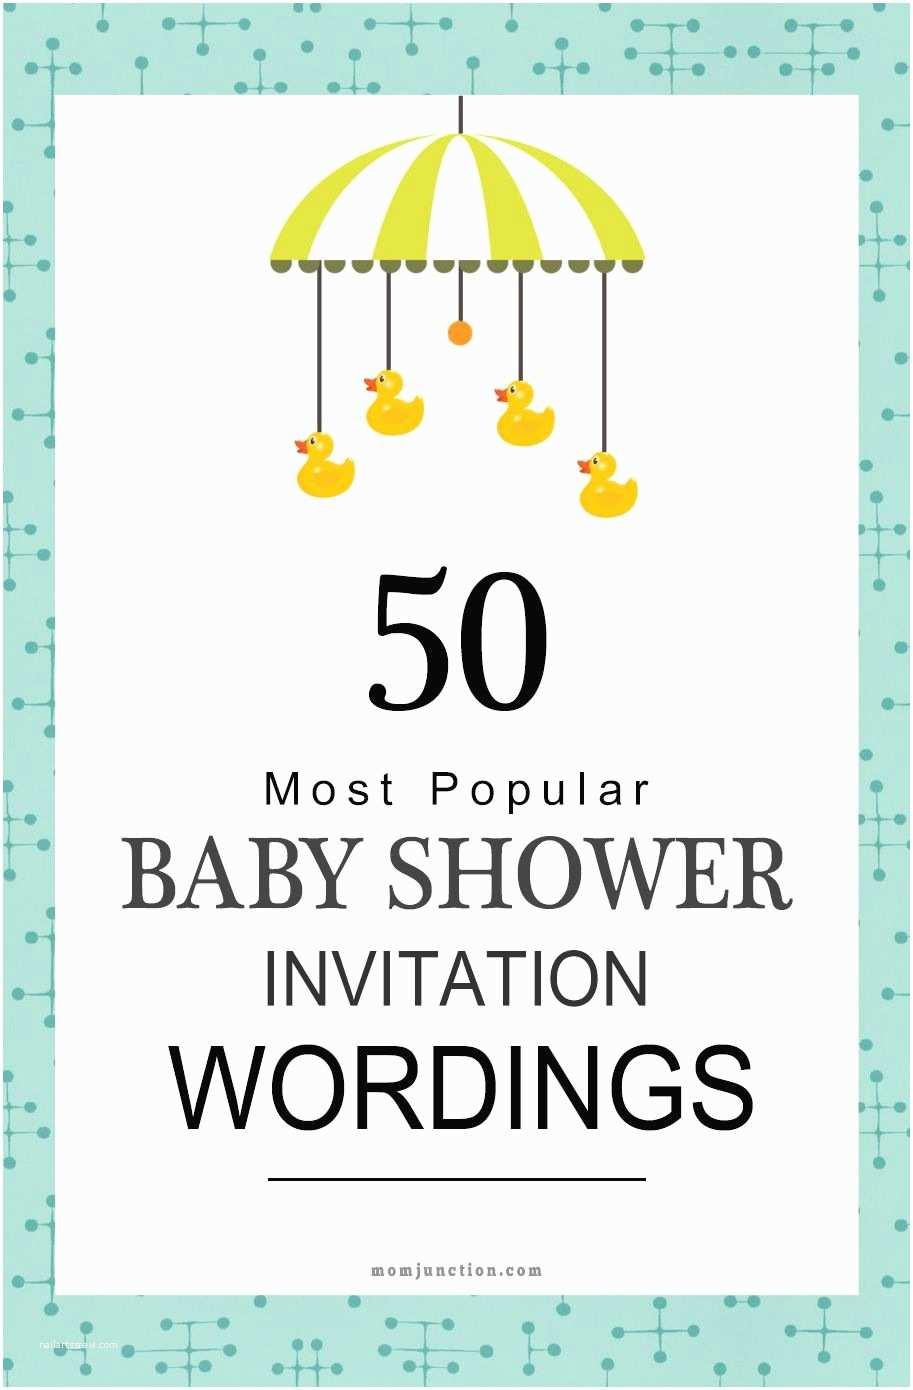 Baby Shower Invitation Templates 75 Most Popular Baby Shower Invitation Wordings